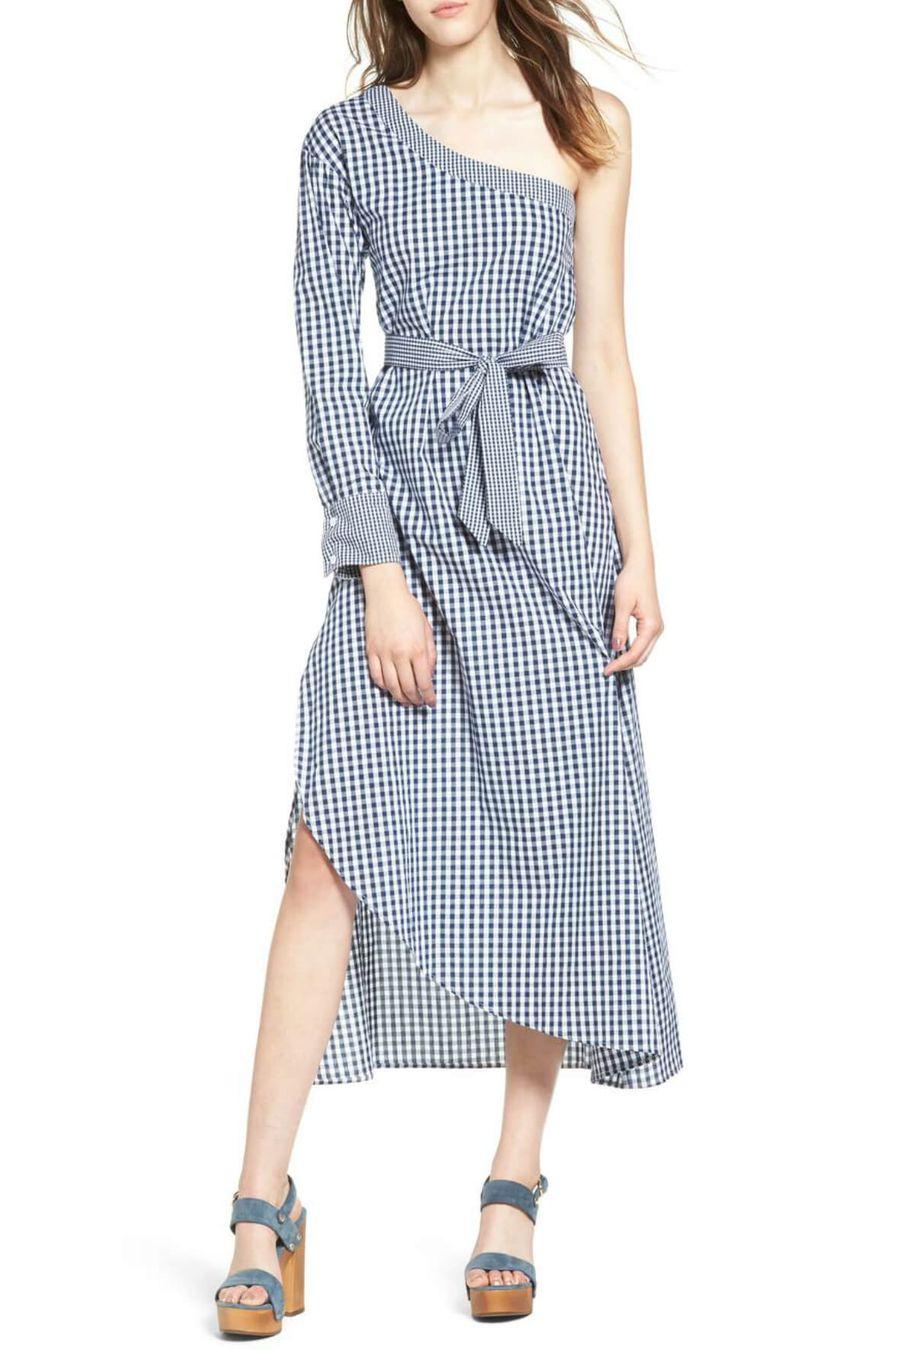 stylekeepers-unforgettable-dress-3